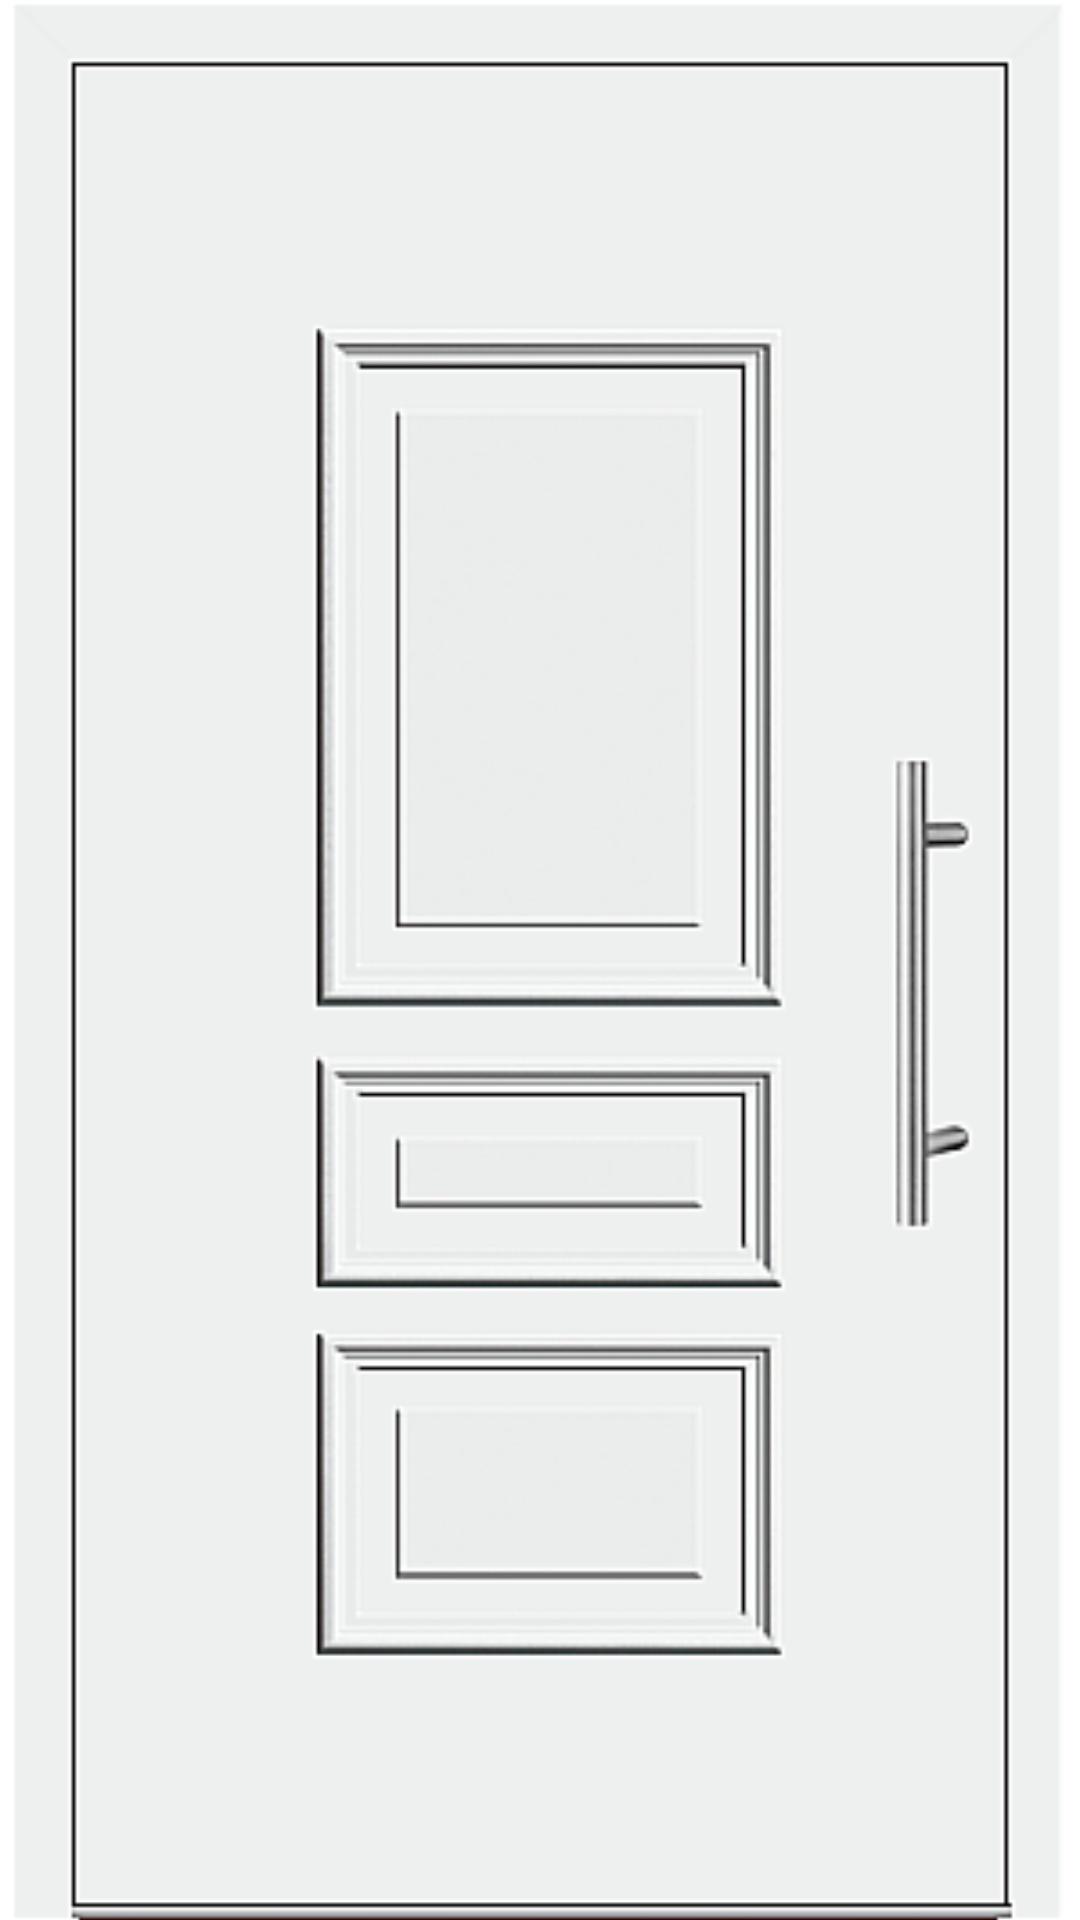 Aluminium Haustür Modell 343-90 weiß